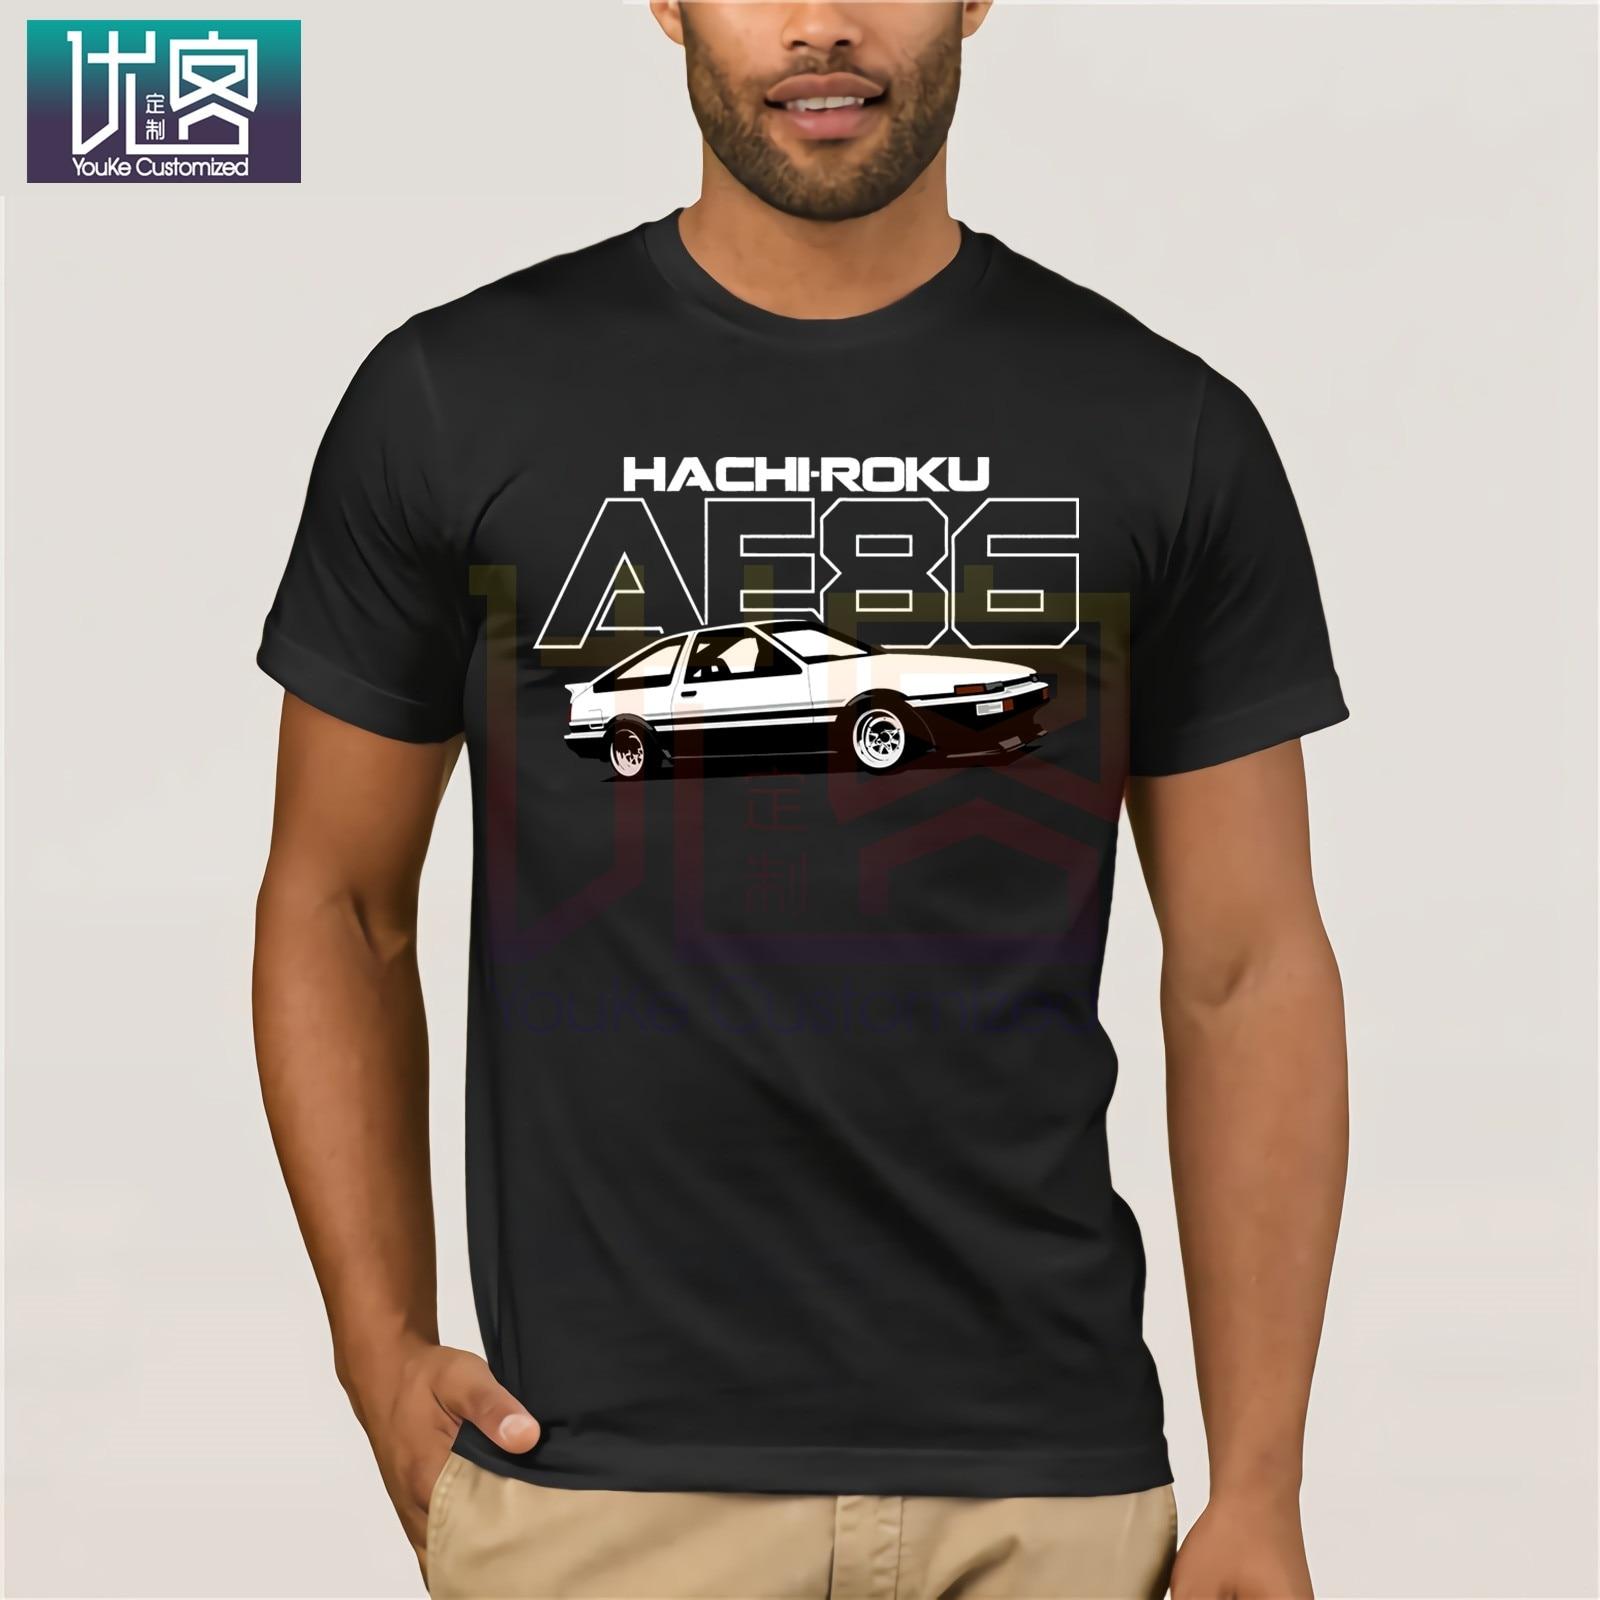 Camiseta Cool Toyota Ae86 Car, camiseta con inicial de Anime de Fujiwara Takumi Hachiroku, camiseta Harajuku, divertidas camisetas de algodón